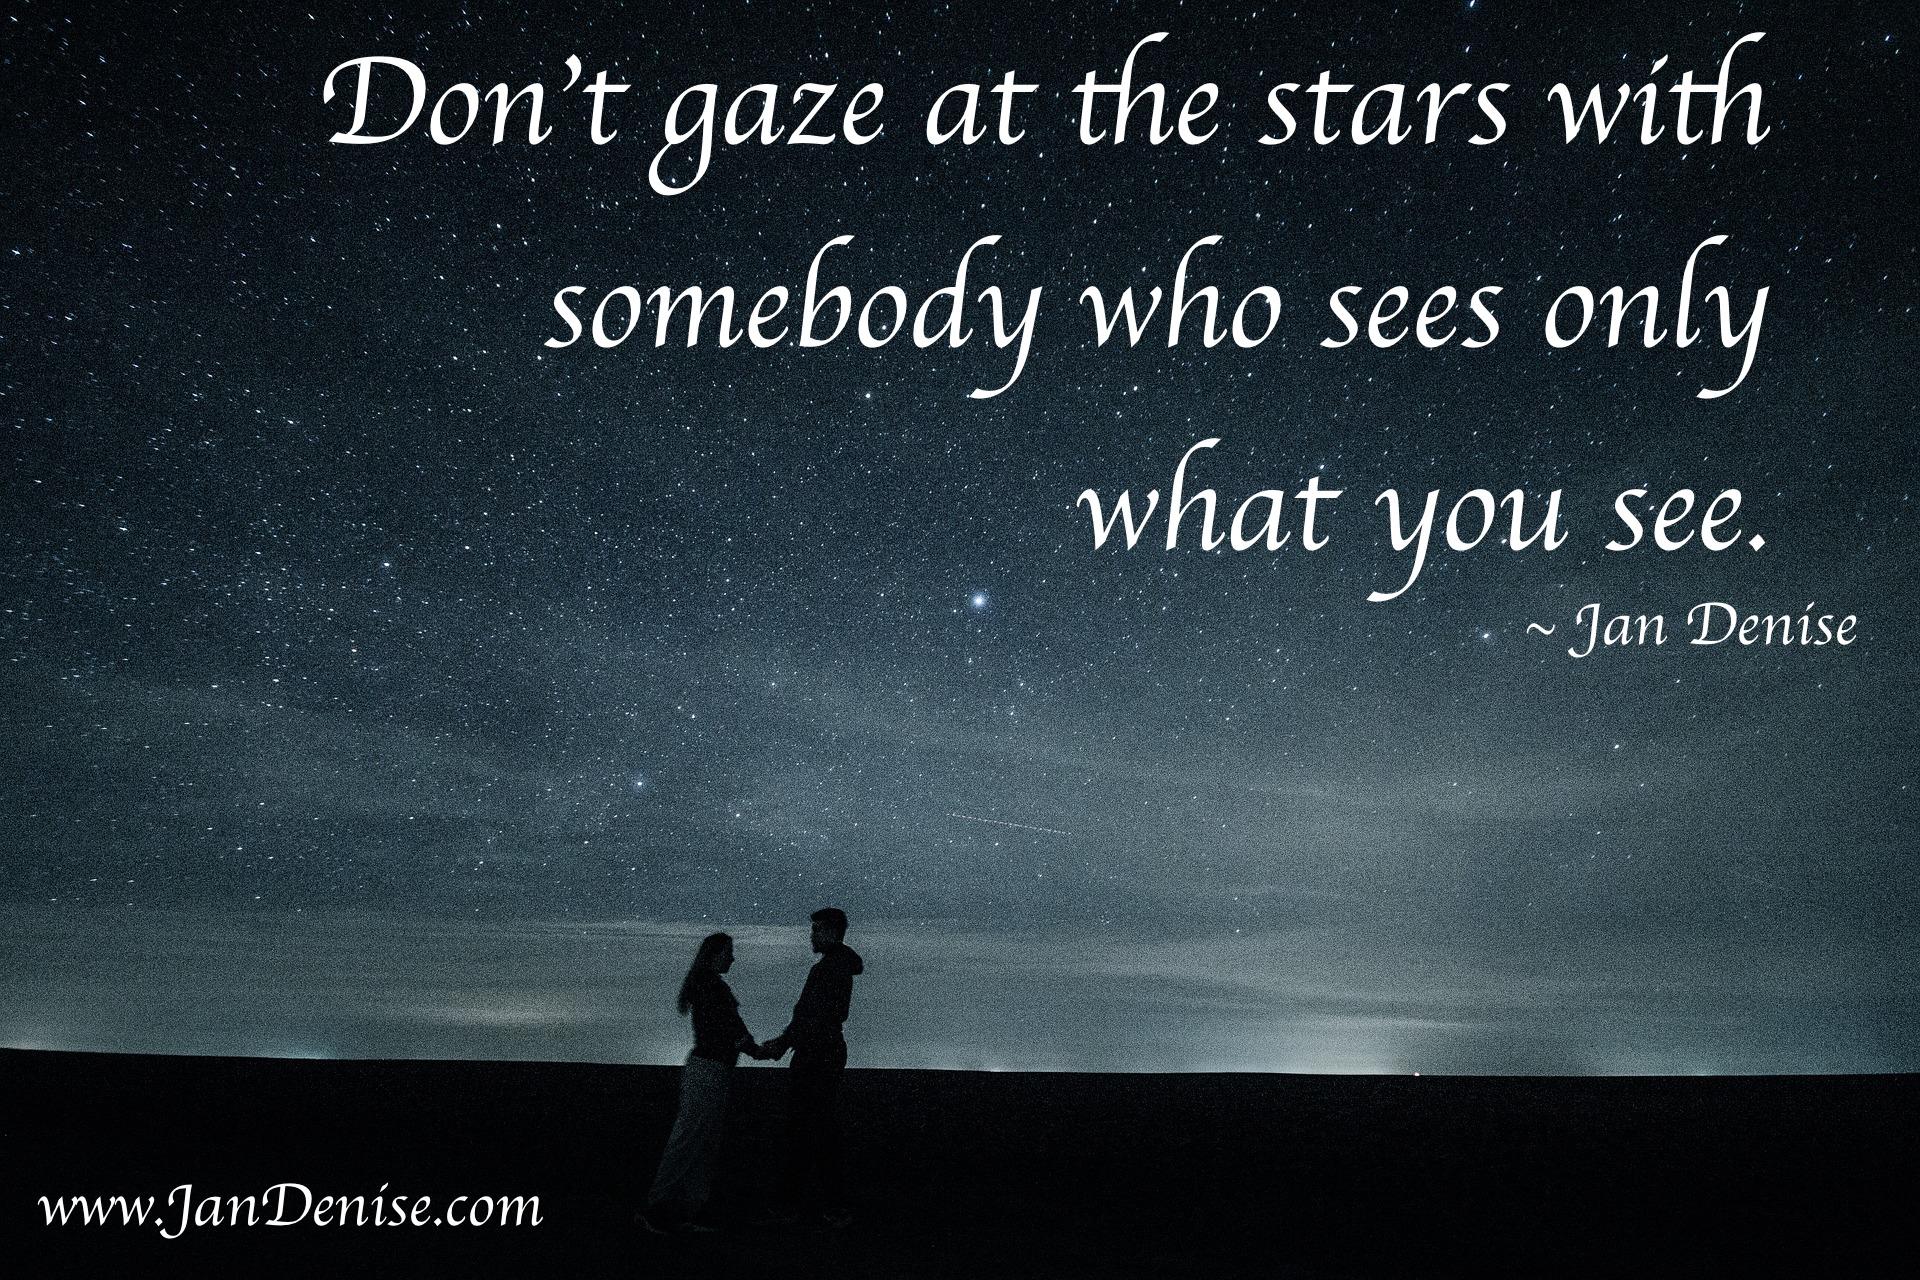 Gaze at something new …